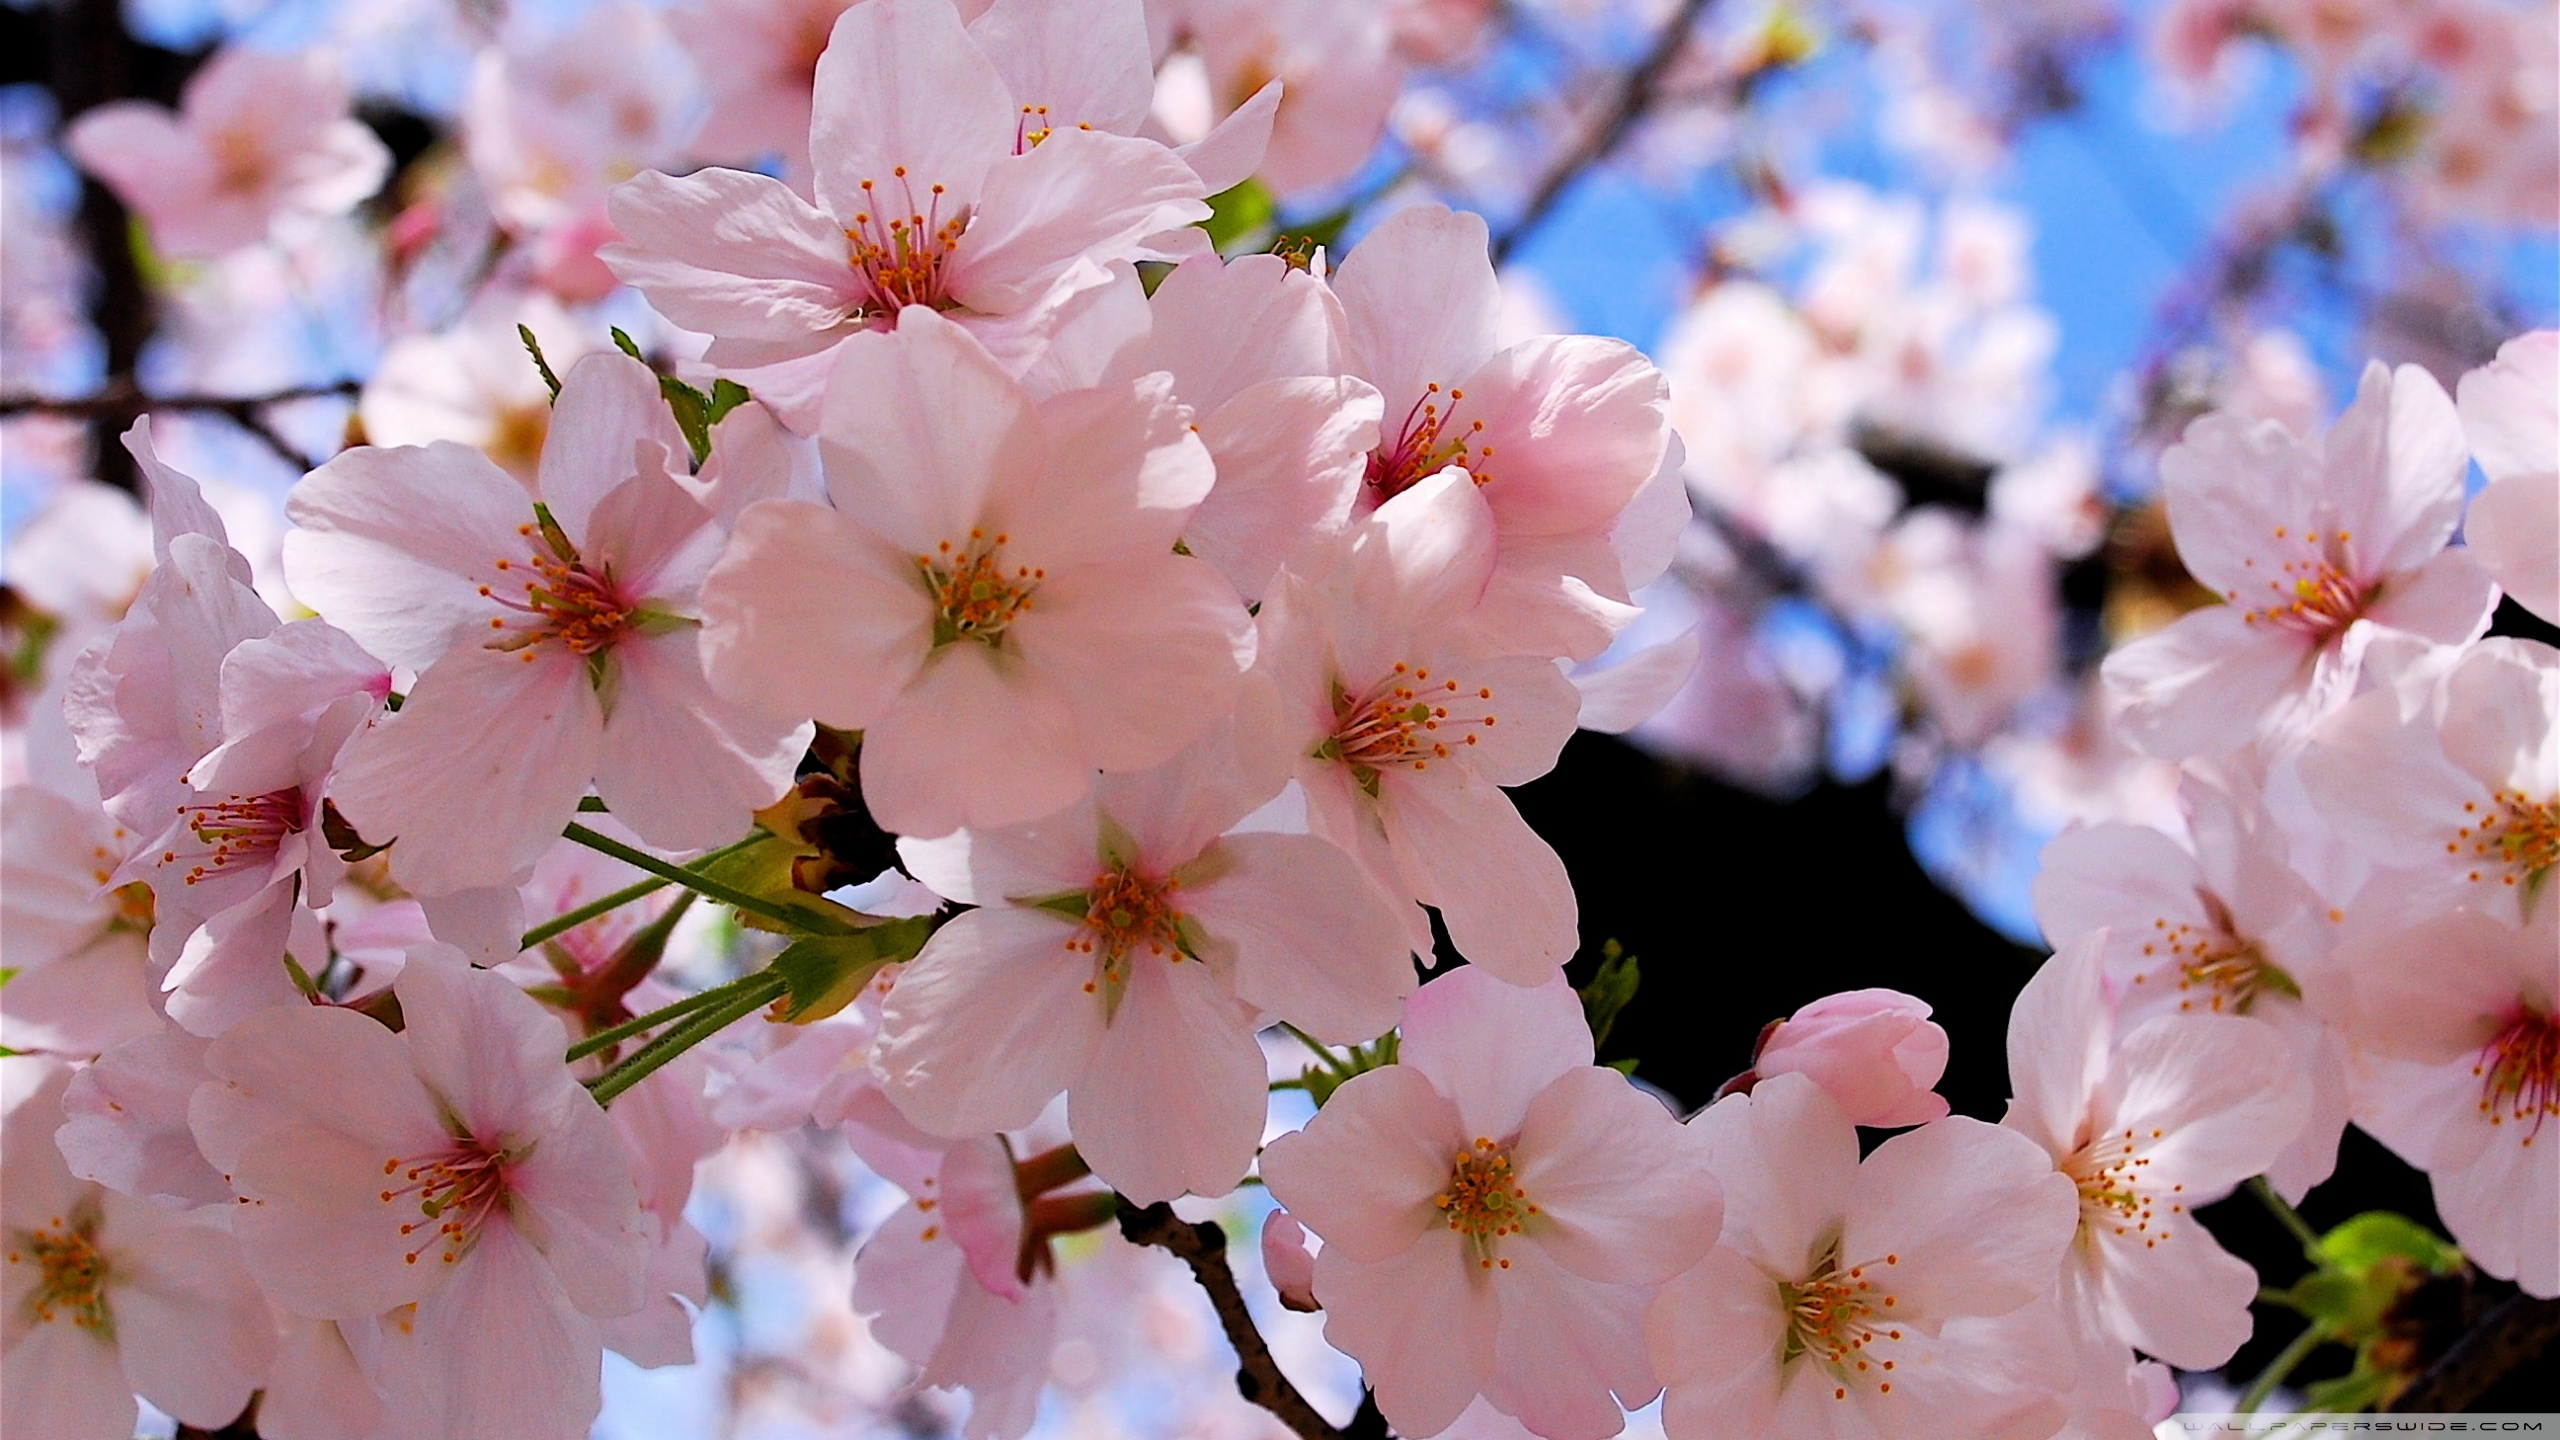 spring_pink_blossoms-wallpaper-2560x1440.jpg